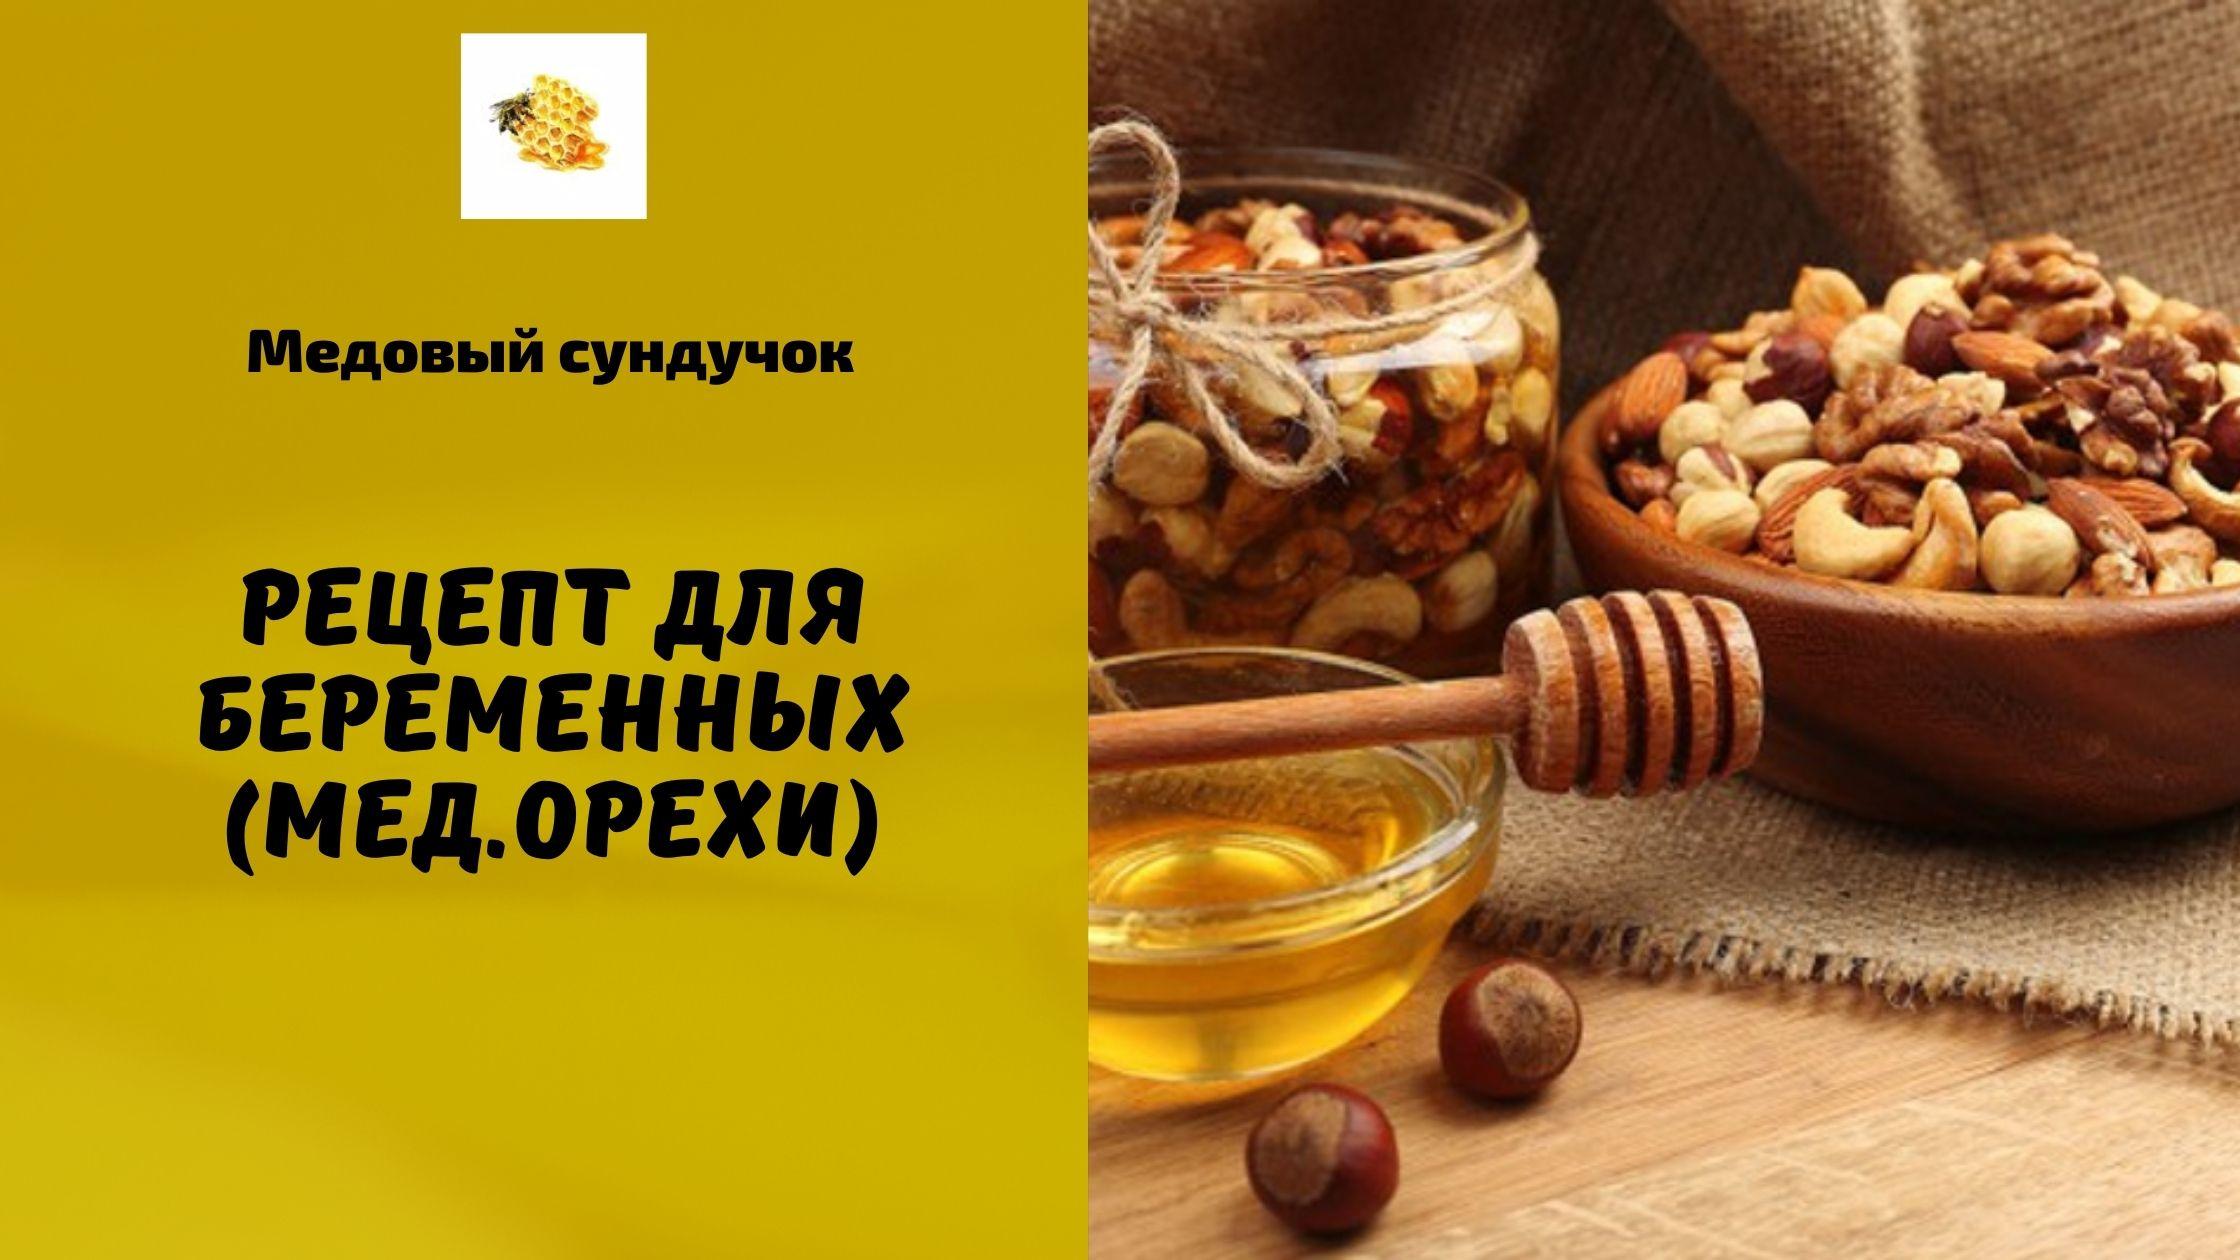 Рецепт для беременных (Мёд. Орехи)